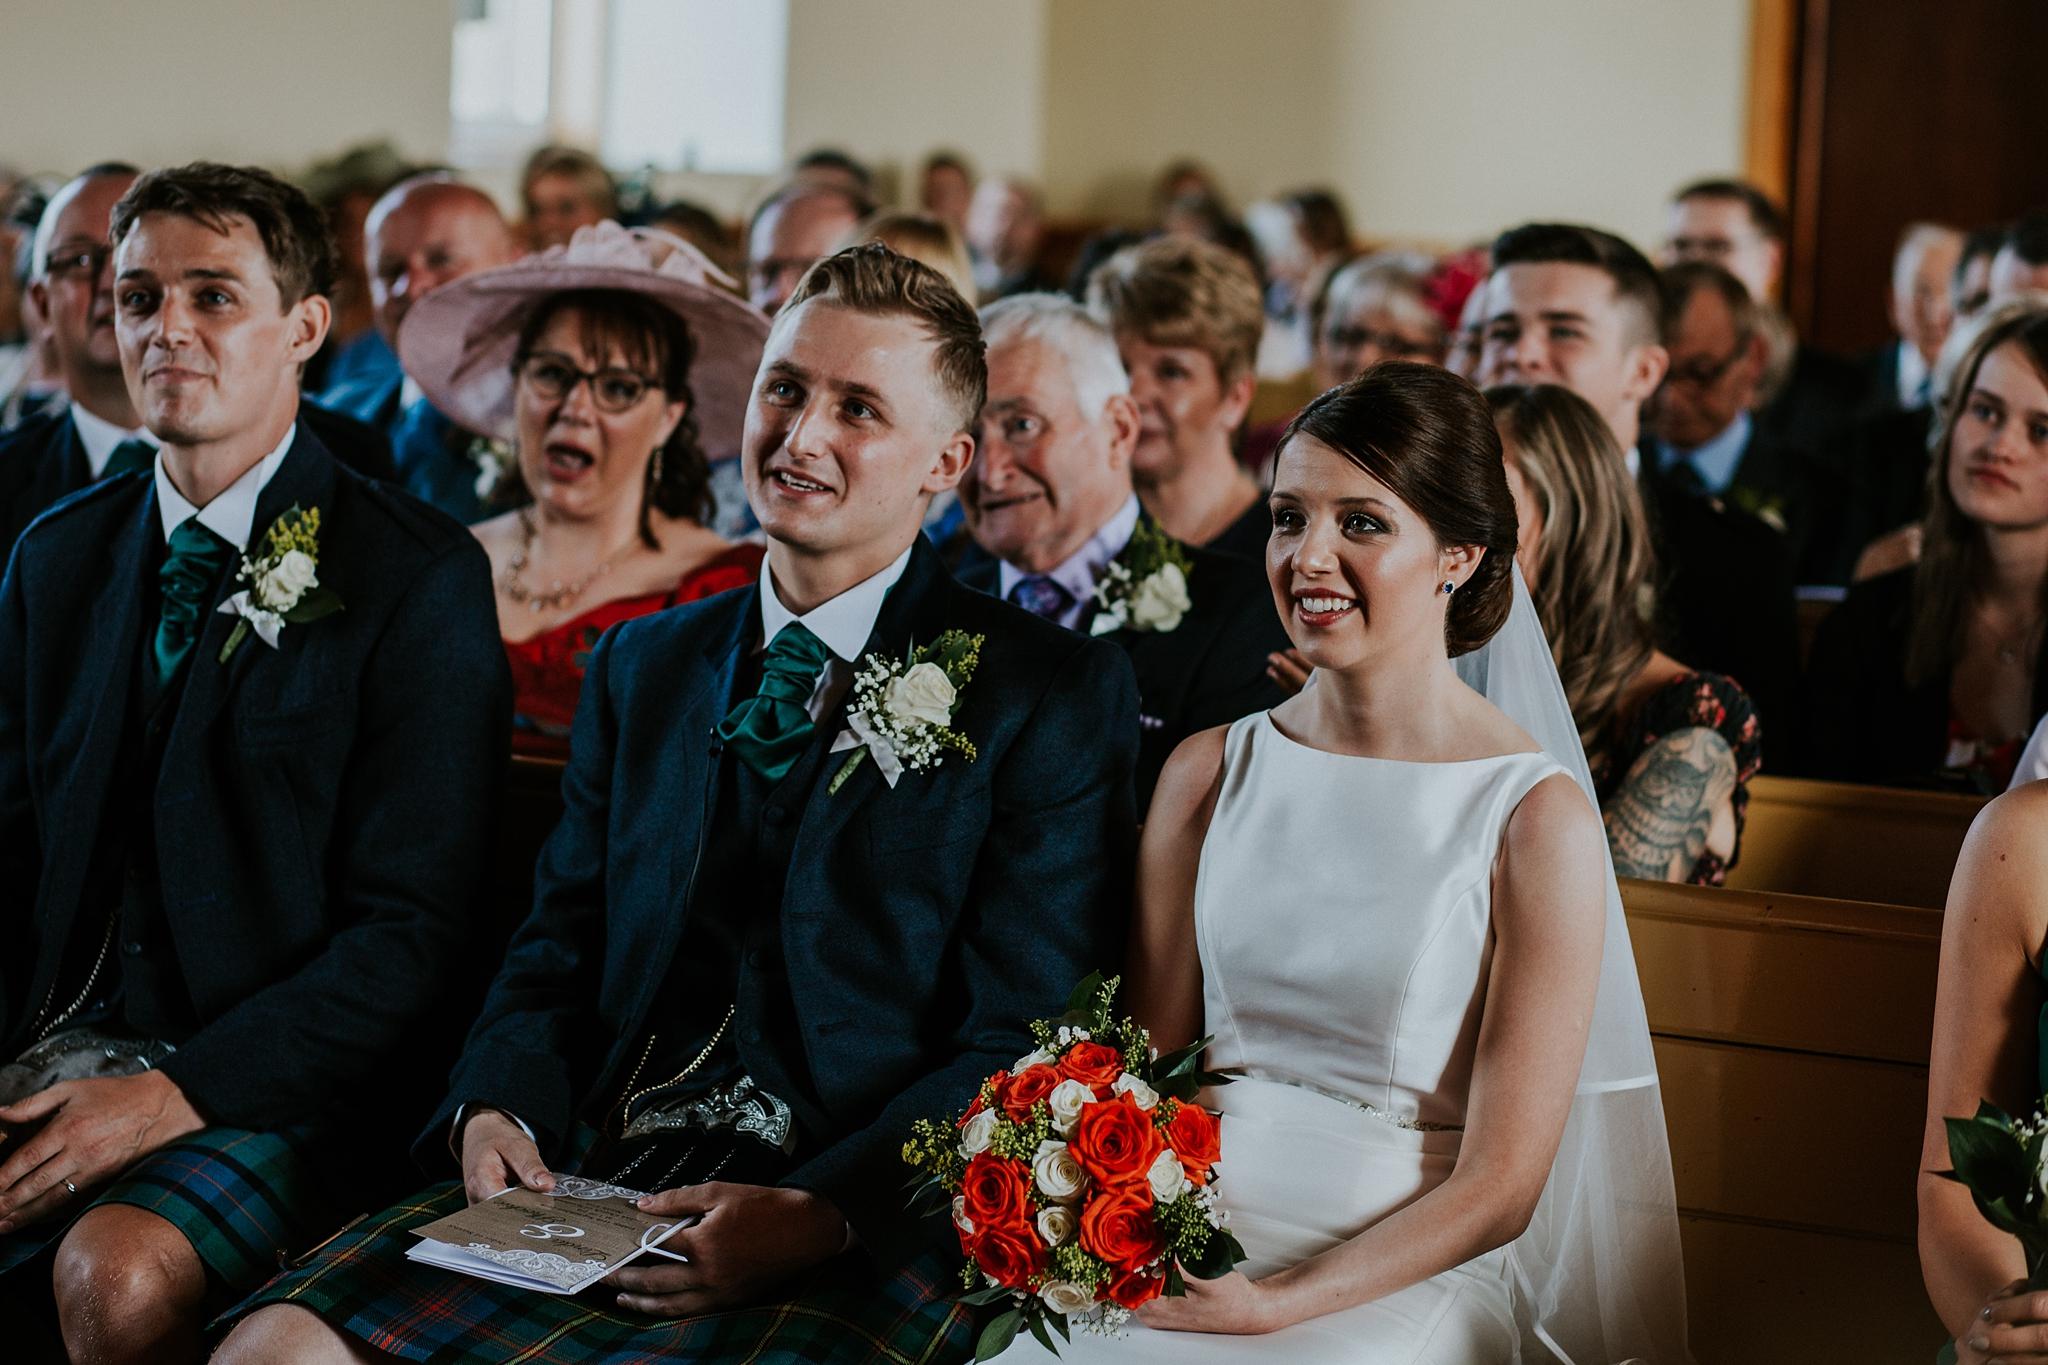 Linda&Shockie_northuist_wedding_photographer-19.JPG